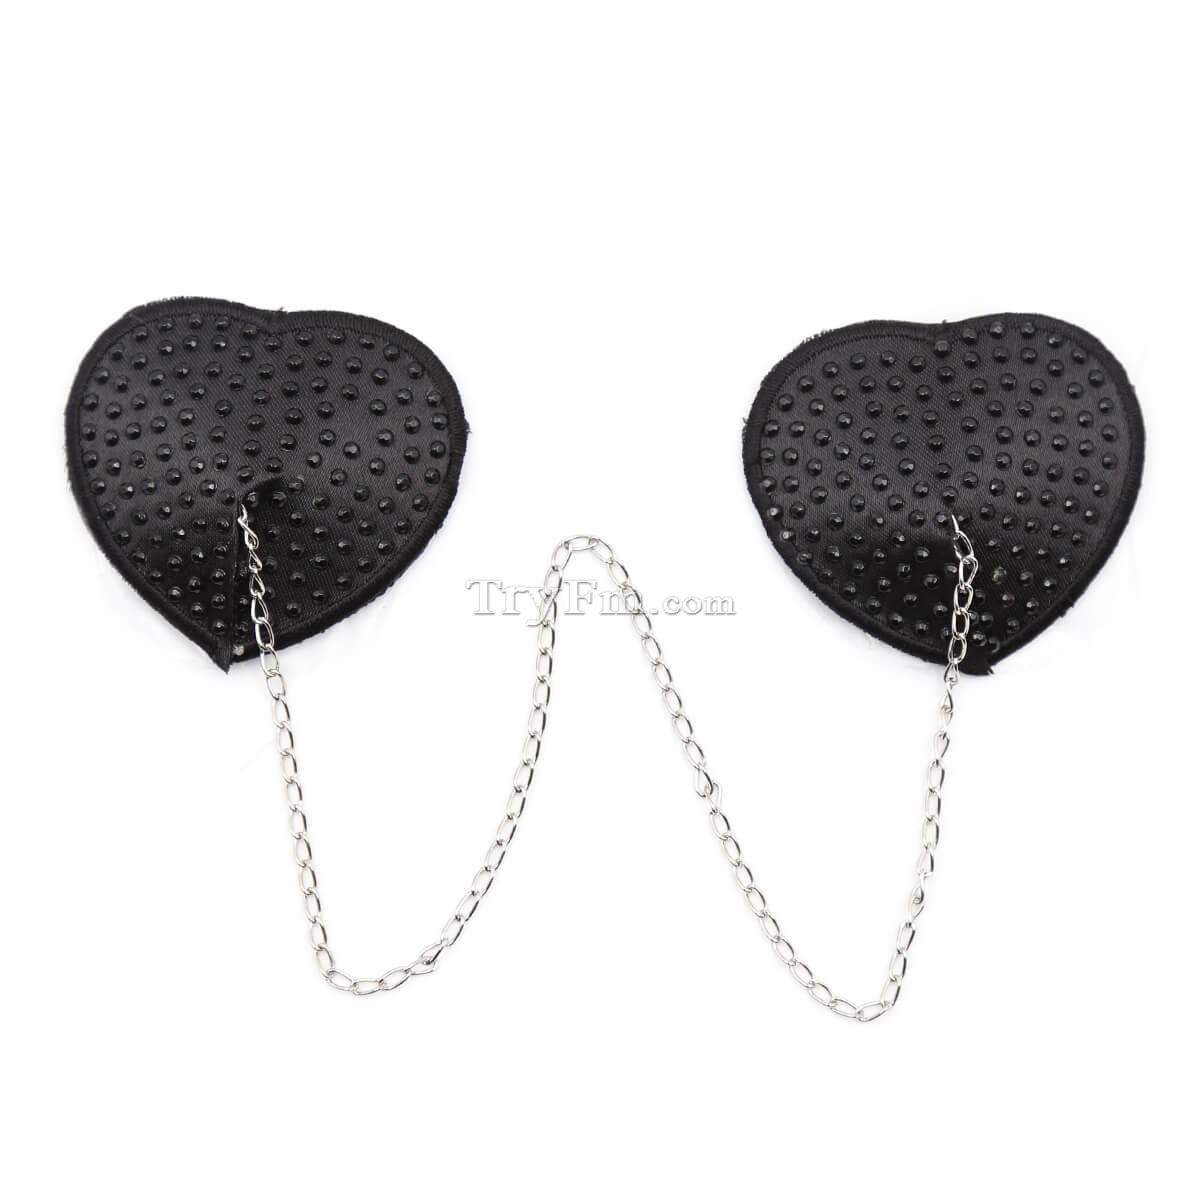 15-Glitter-heart-pasties6.jpg